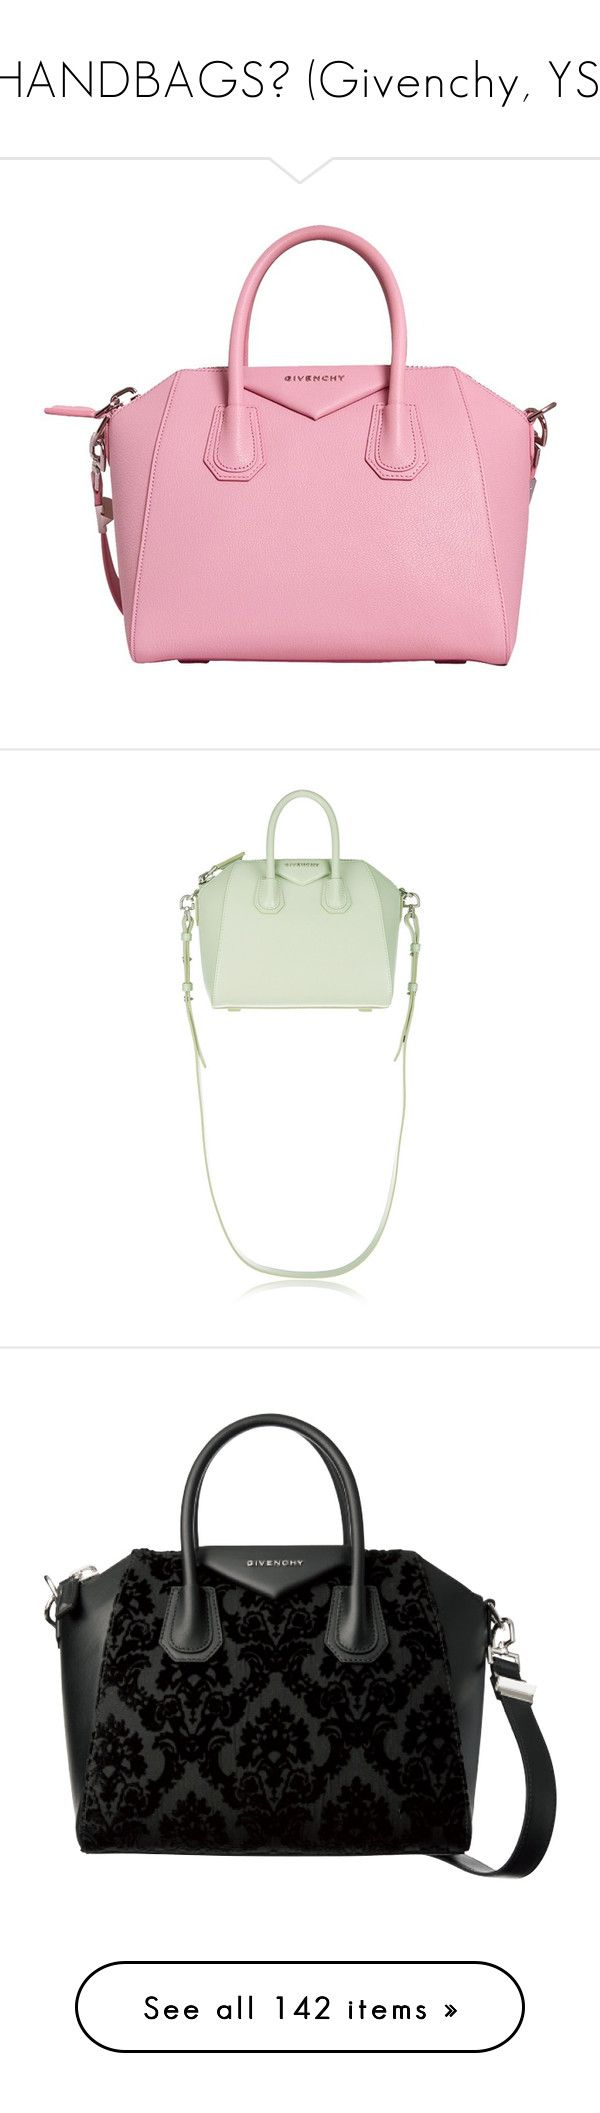 """✮HANDBAGS✮ (Givenchy, YSL)"" by marcellamic ❤ liked on Polyvore featuring bags, handbags, purses, handbag purse, leather man bags, pink hand bags, hand bags, pink purse, mini duffle bag and white patent leather handbag"